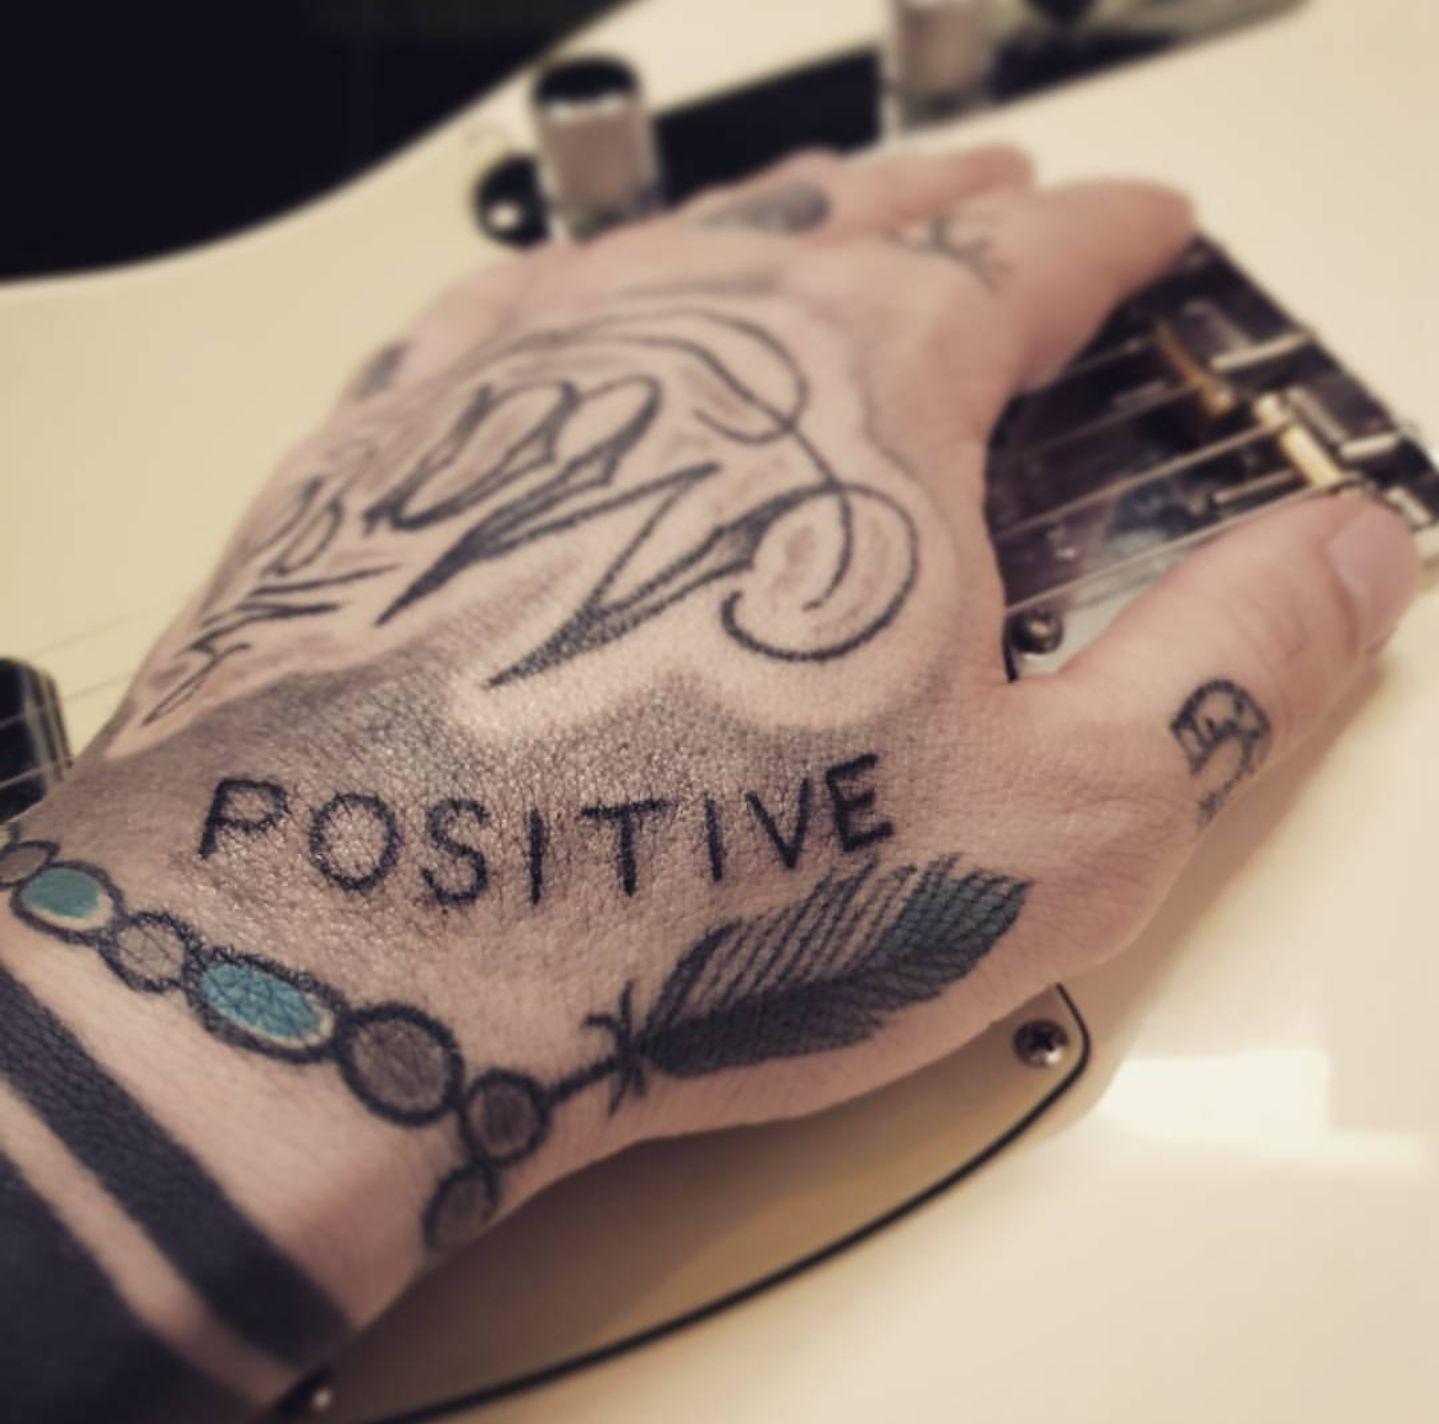 Phil Specs Stay Positive Tattoo Handtattoo Lettering Tattoo